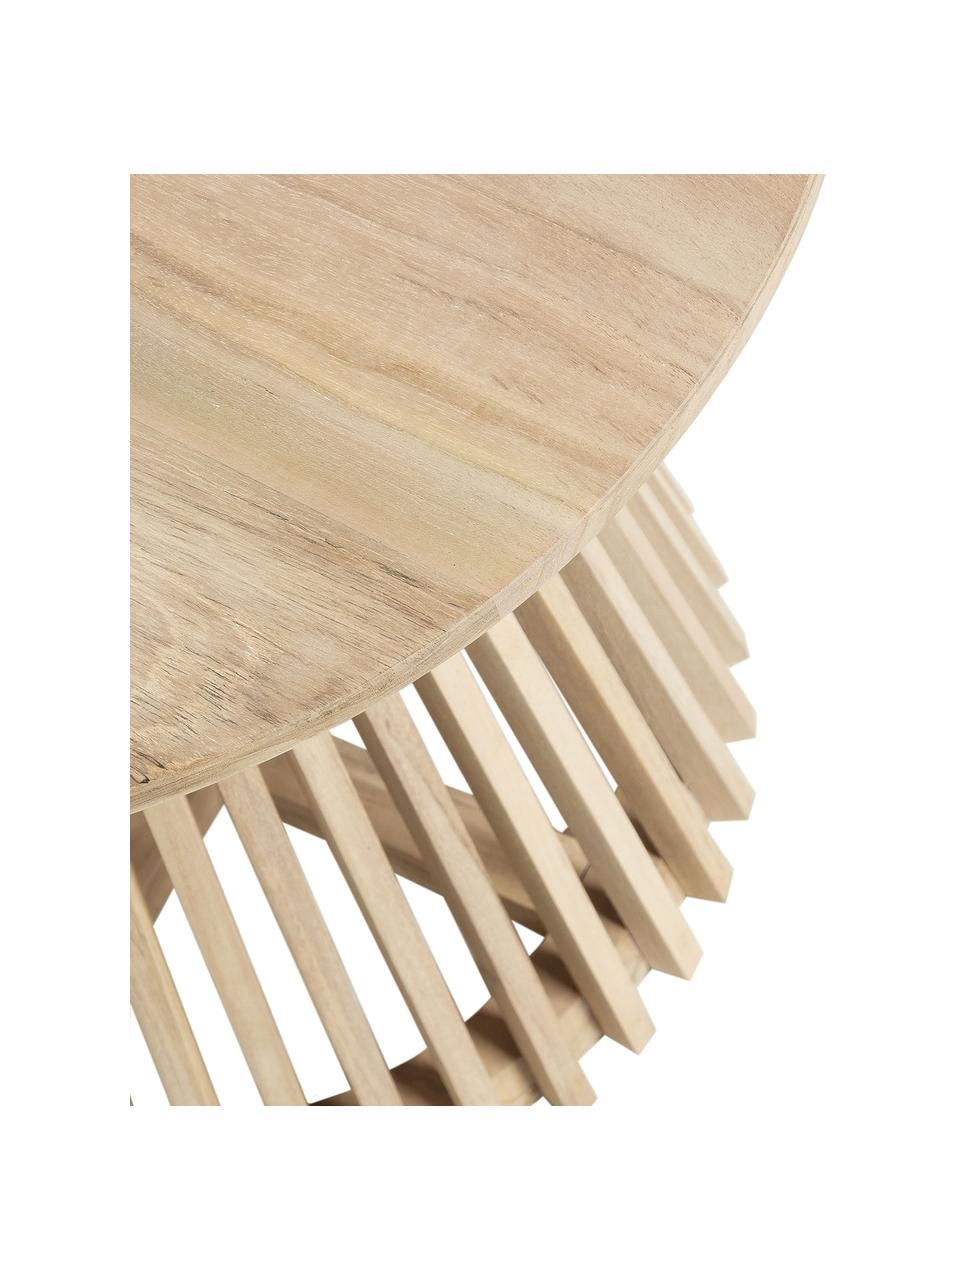 Runder Beistelltisch Jeanette aus Holz, Teakholz, lakiert, Teakholz, Ø 50 x H 48 cm